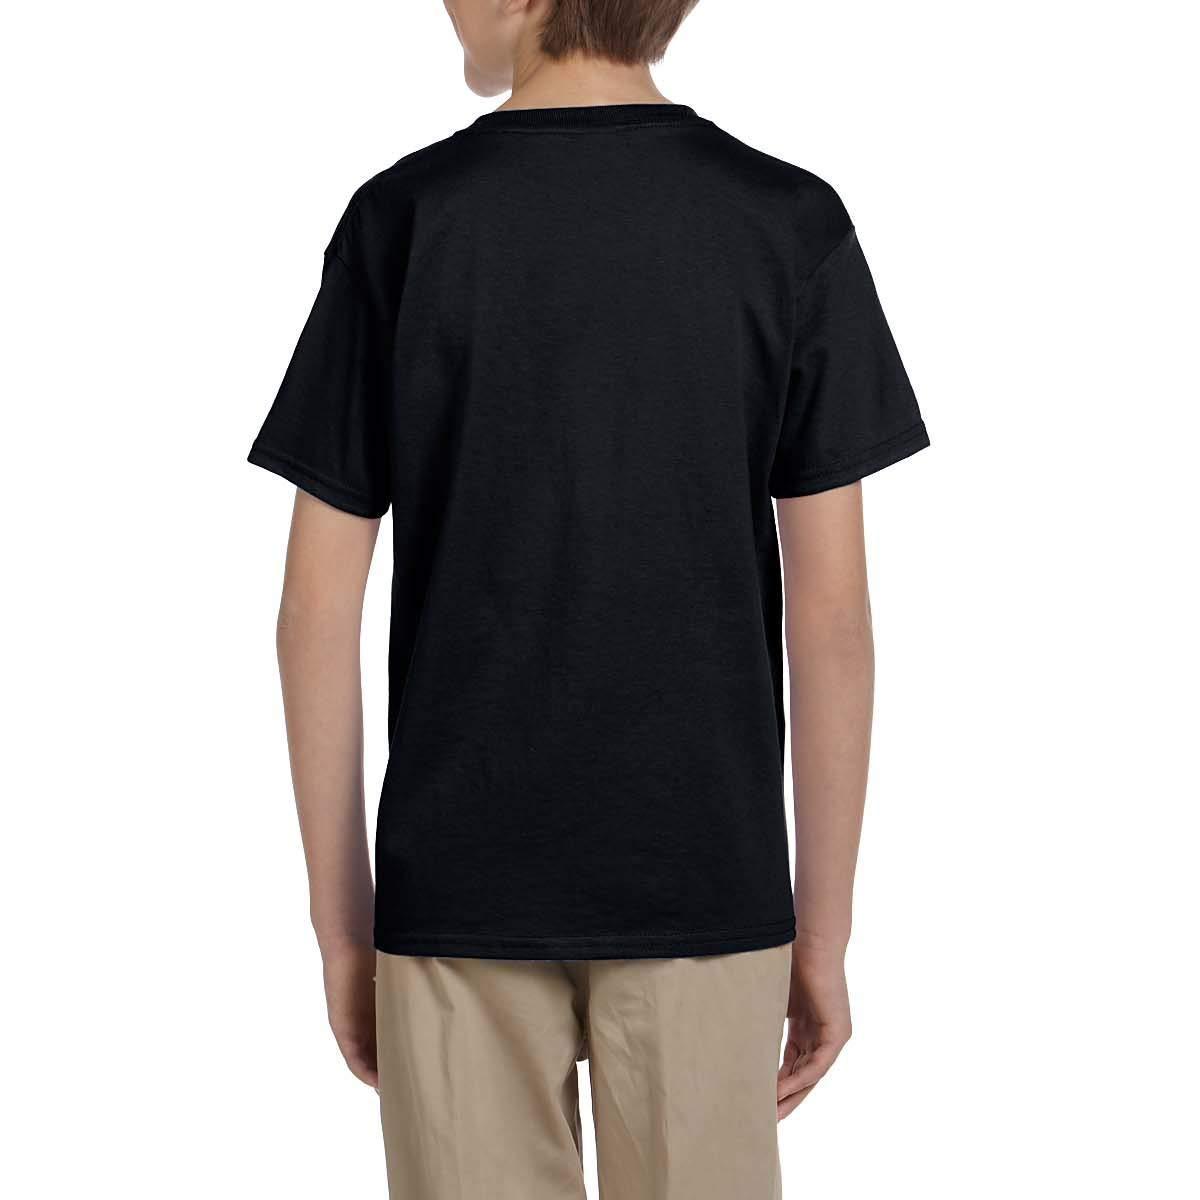 PHD BRU-NO Jurassic Park Youth Kids Cotton T-Shirts Summer Slim-fit Printed Fashion Tee